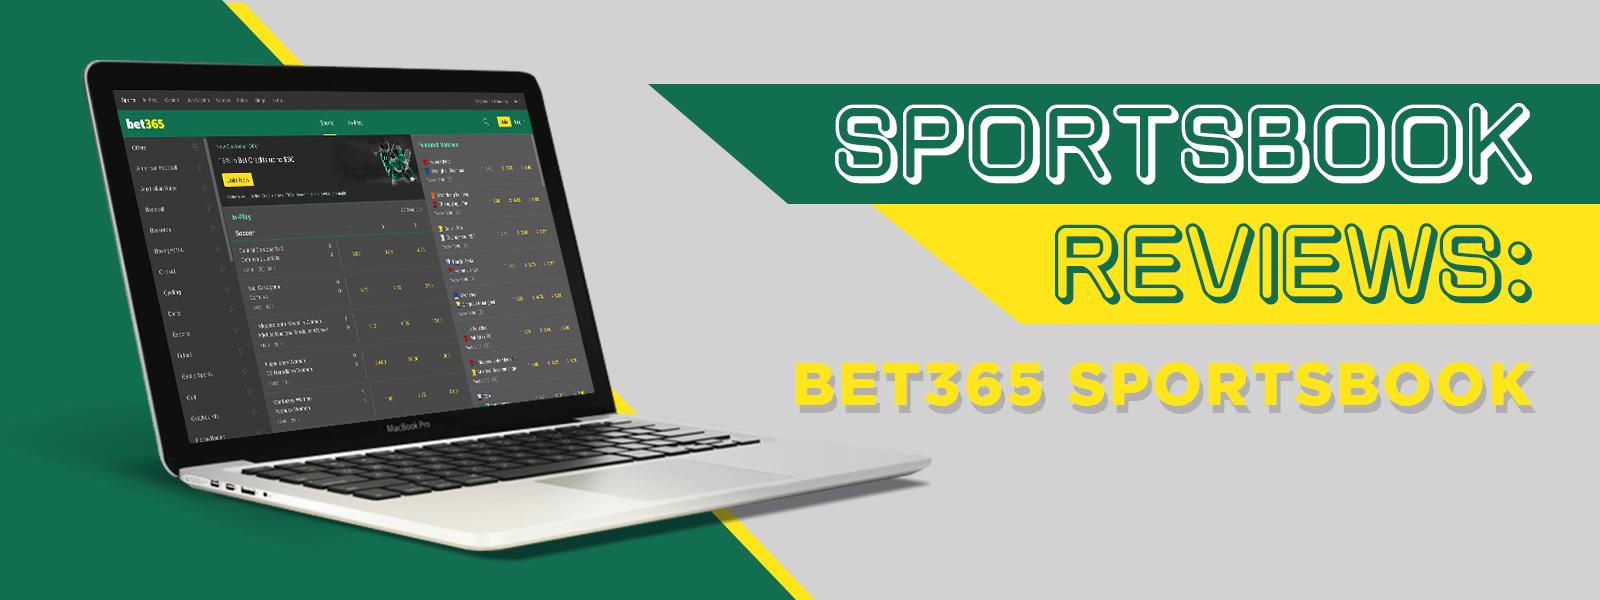 Sportsbook Reviews: Bet365 Sportsbook